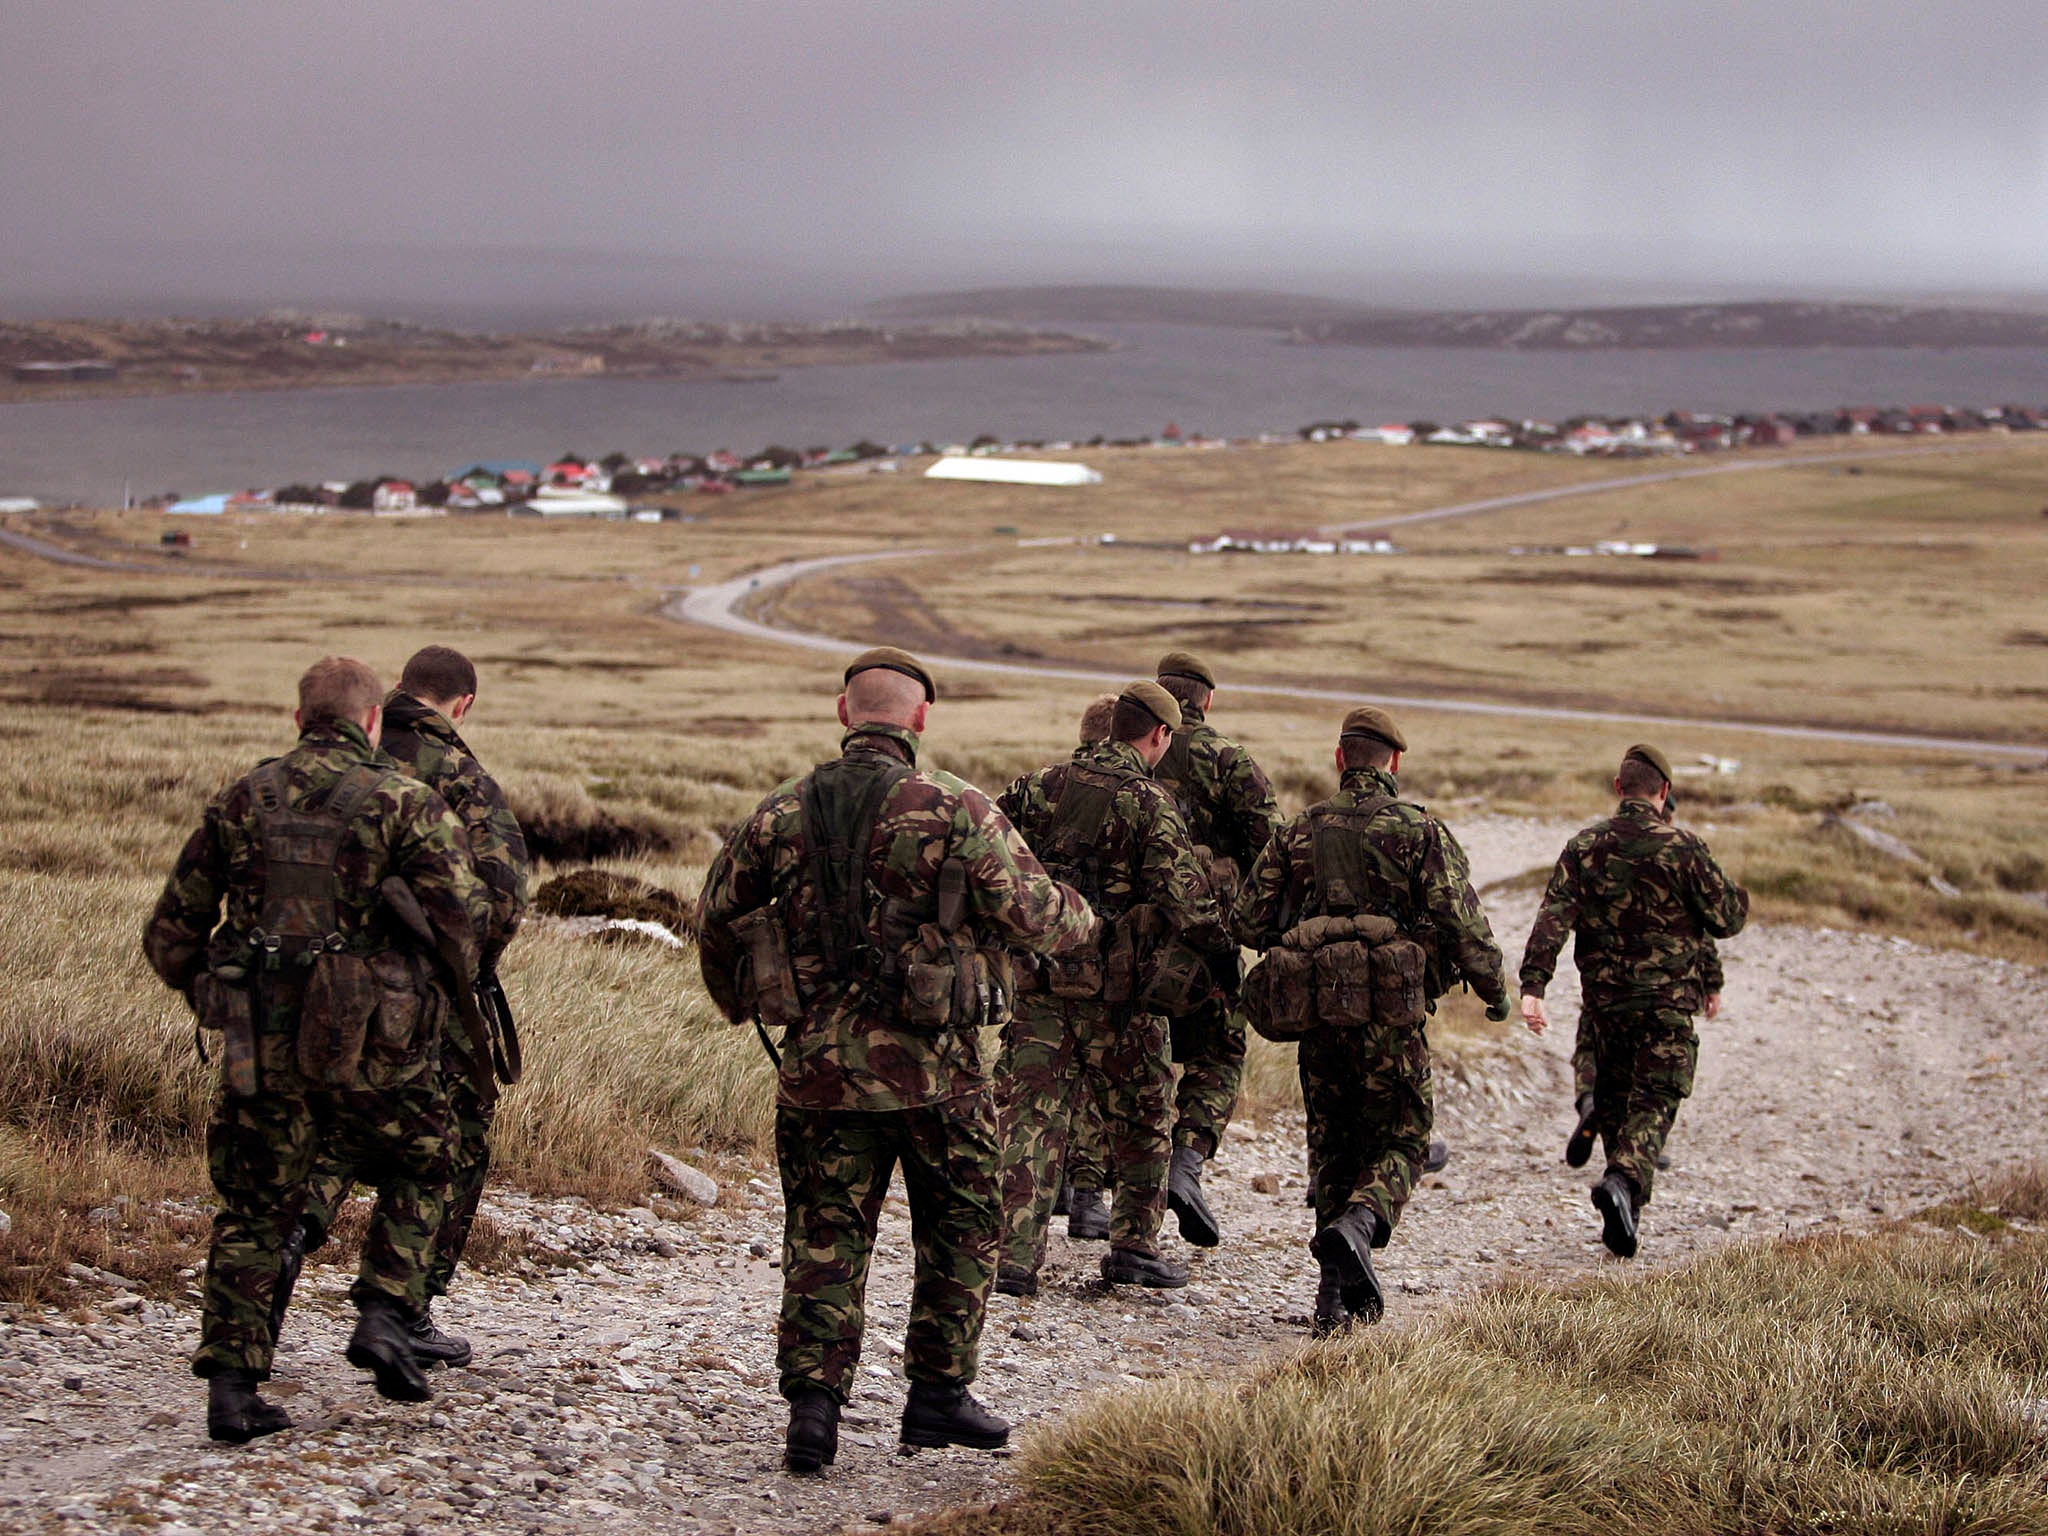 Brexit: EU will refuse to back UK over Falkland Islands in future UN votes , suggests former ambassador